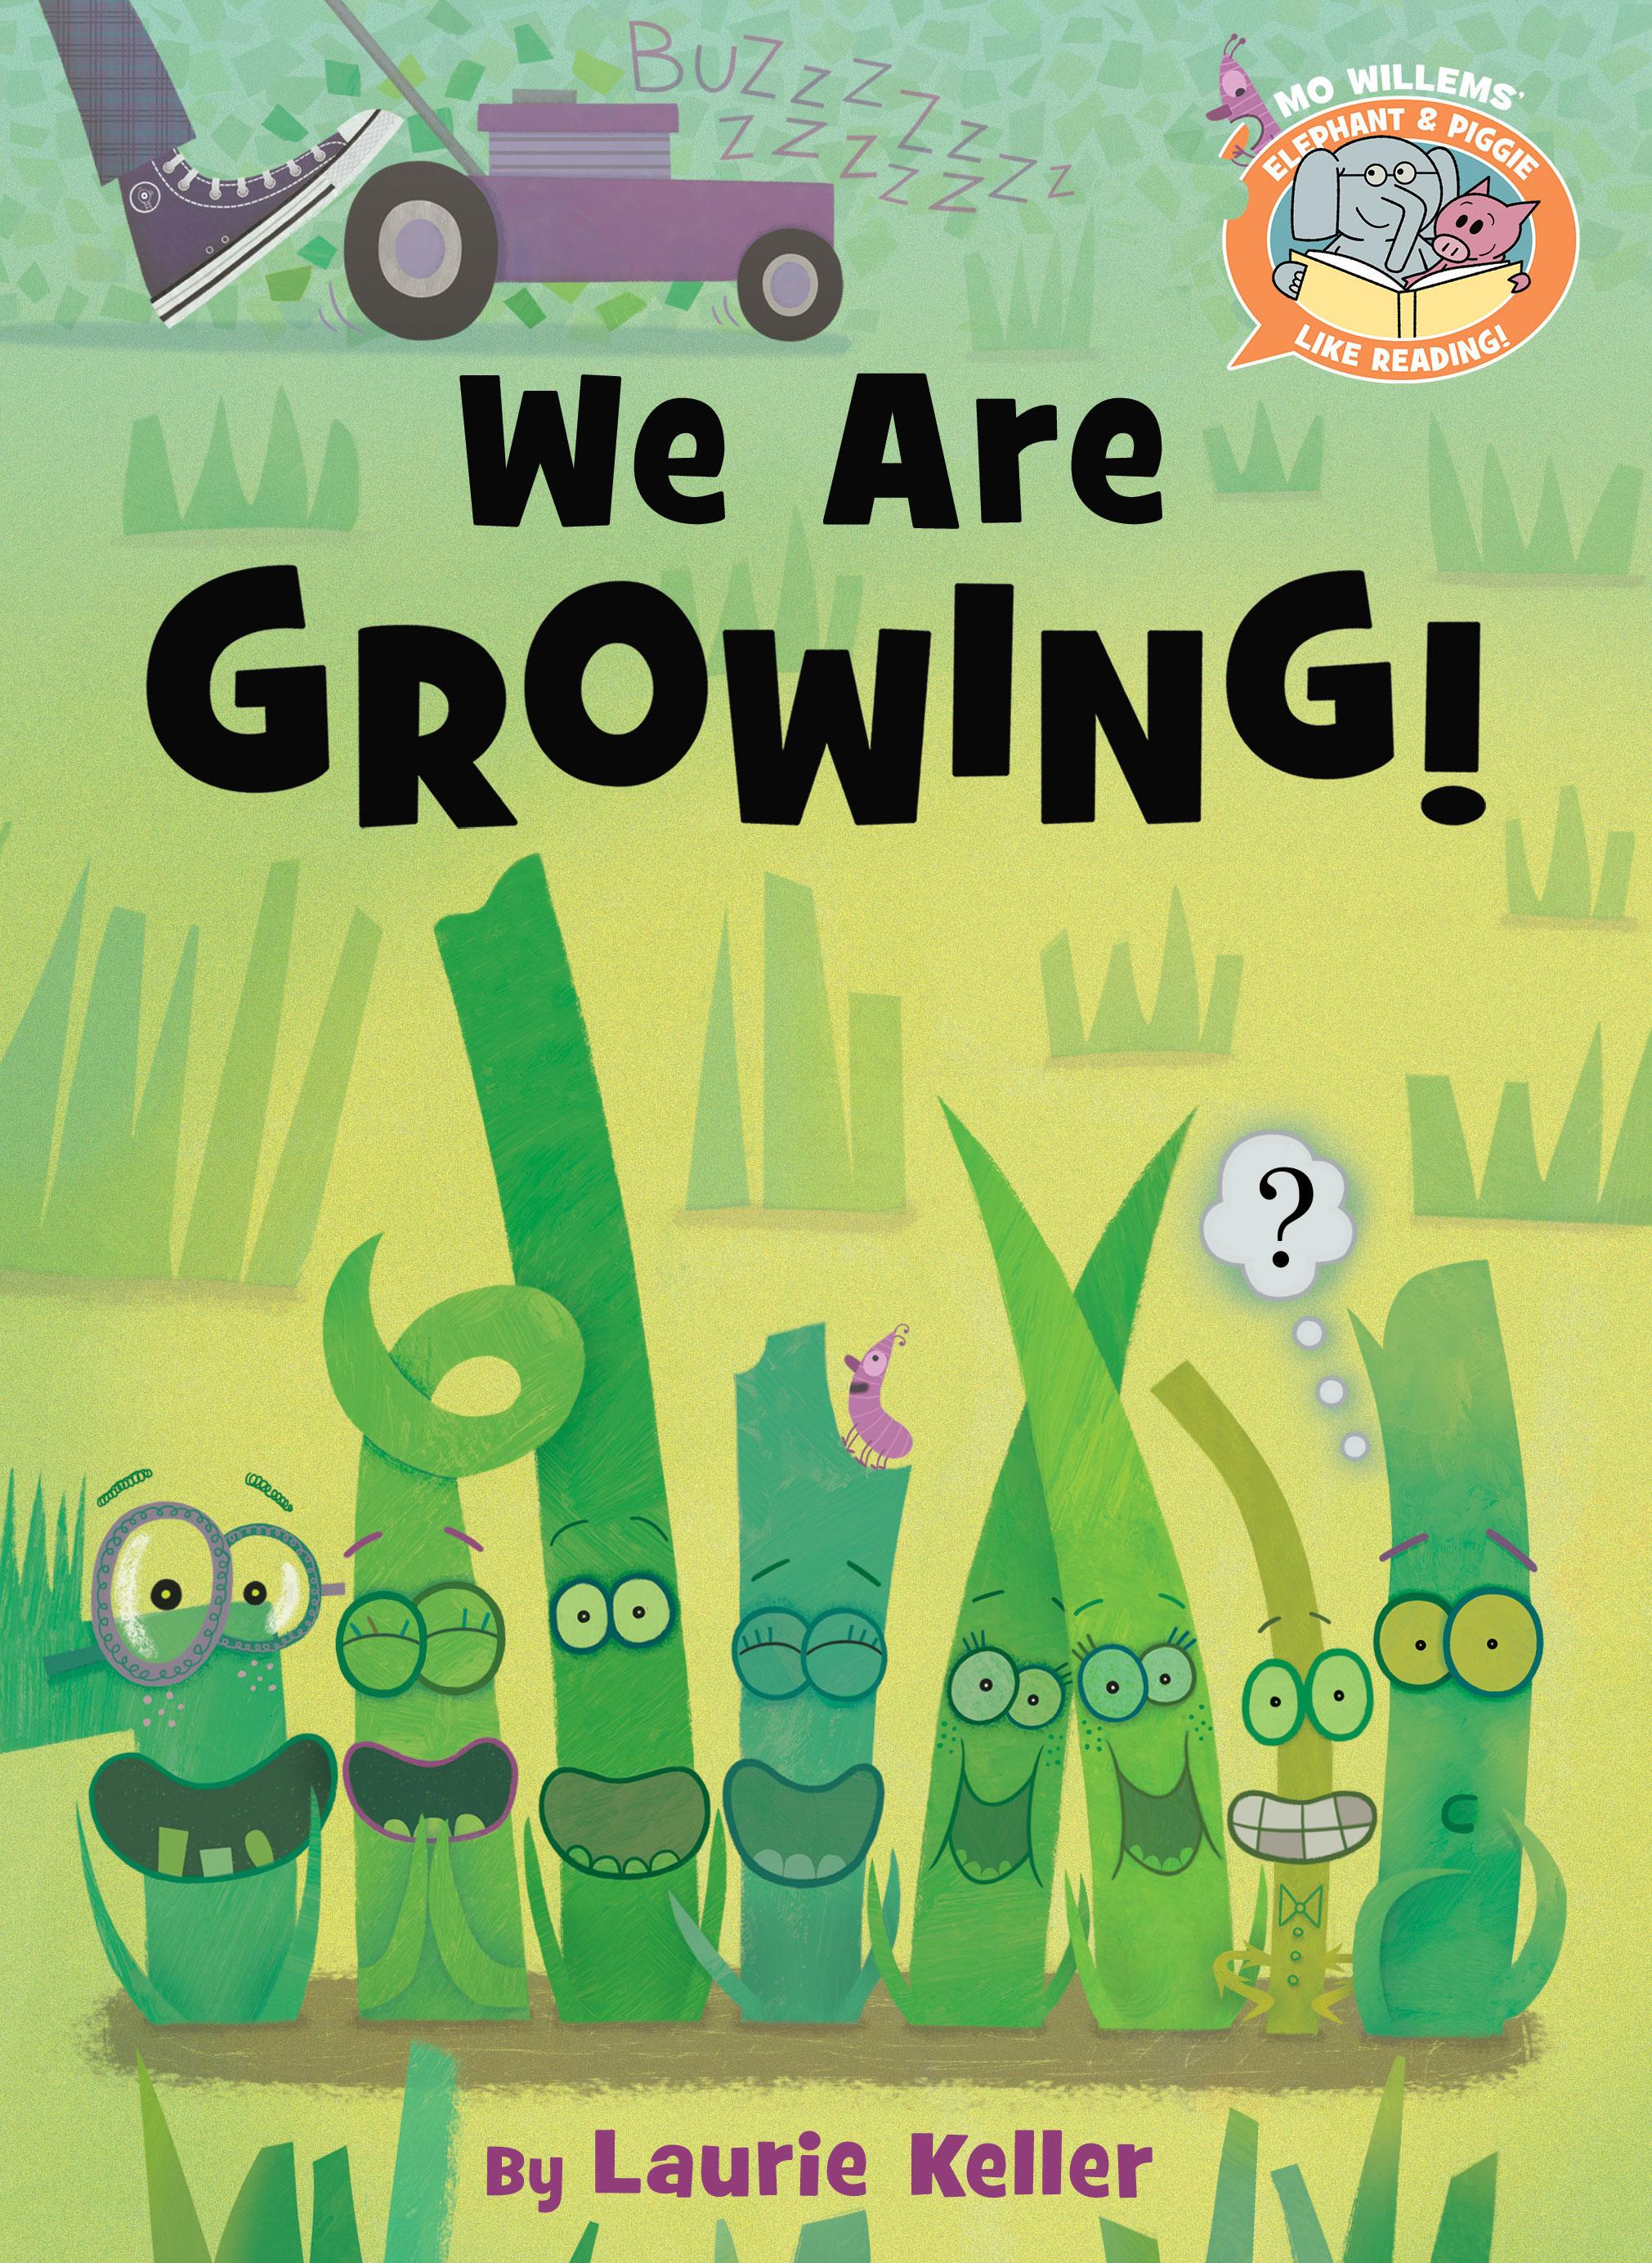 #EPLR #CookieFiasco #WeAreGrowing #books #reading #kids #kidsbooks #ad